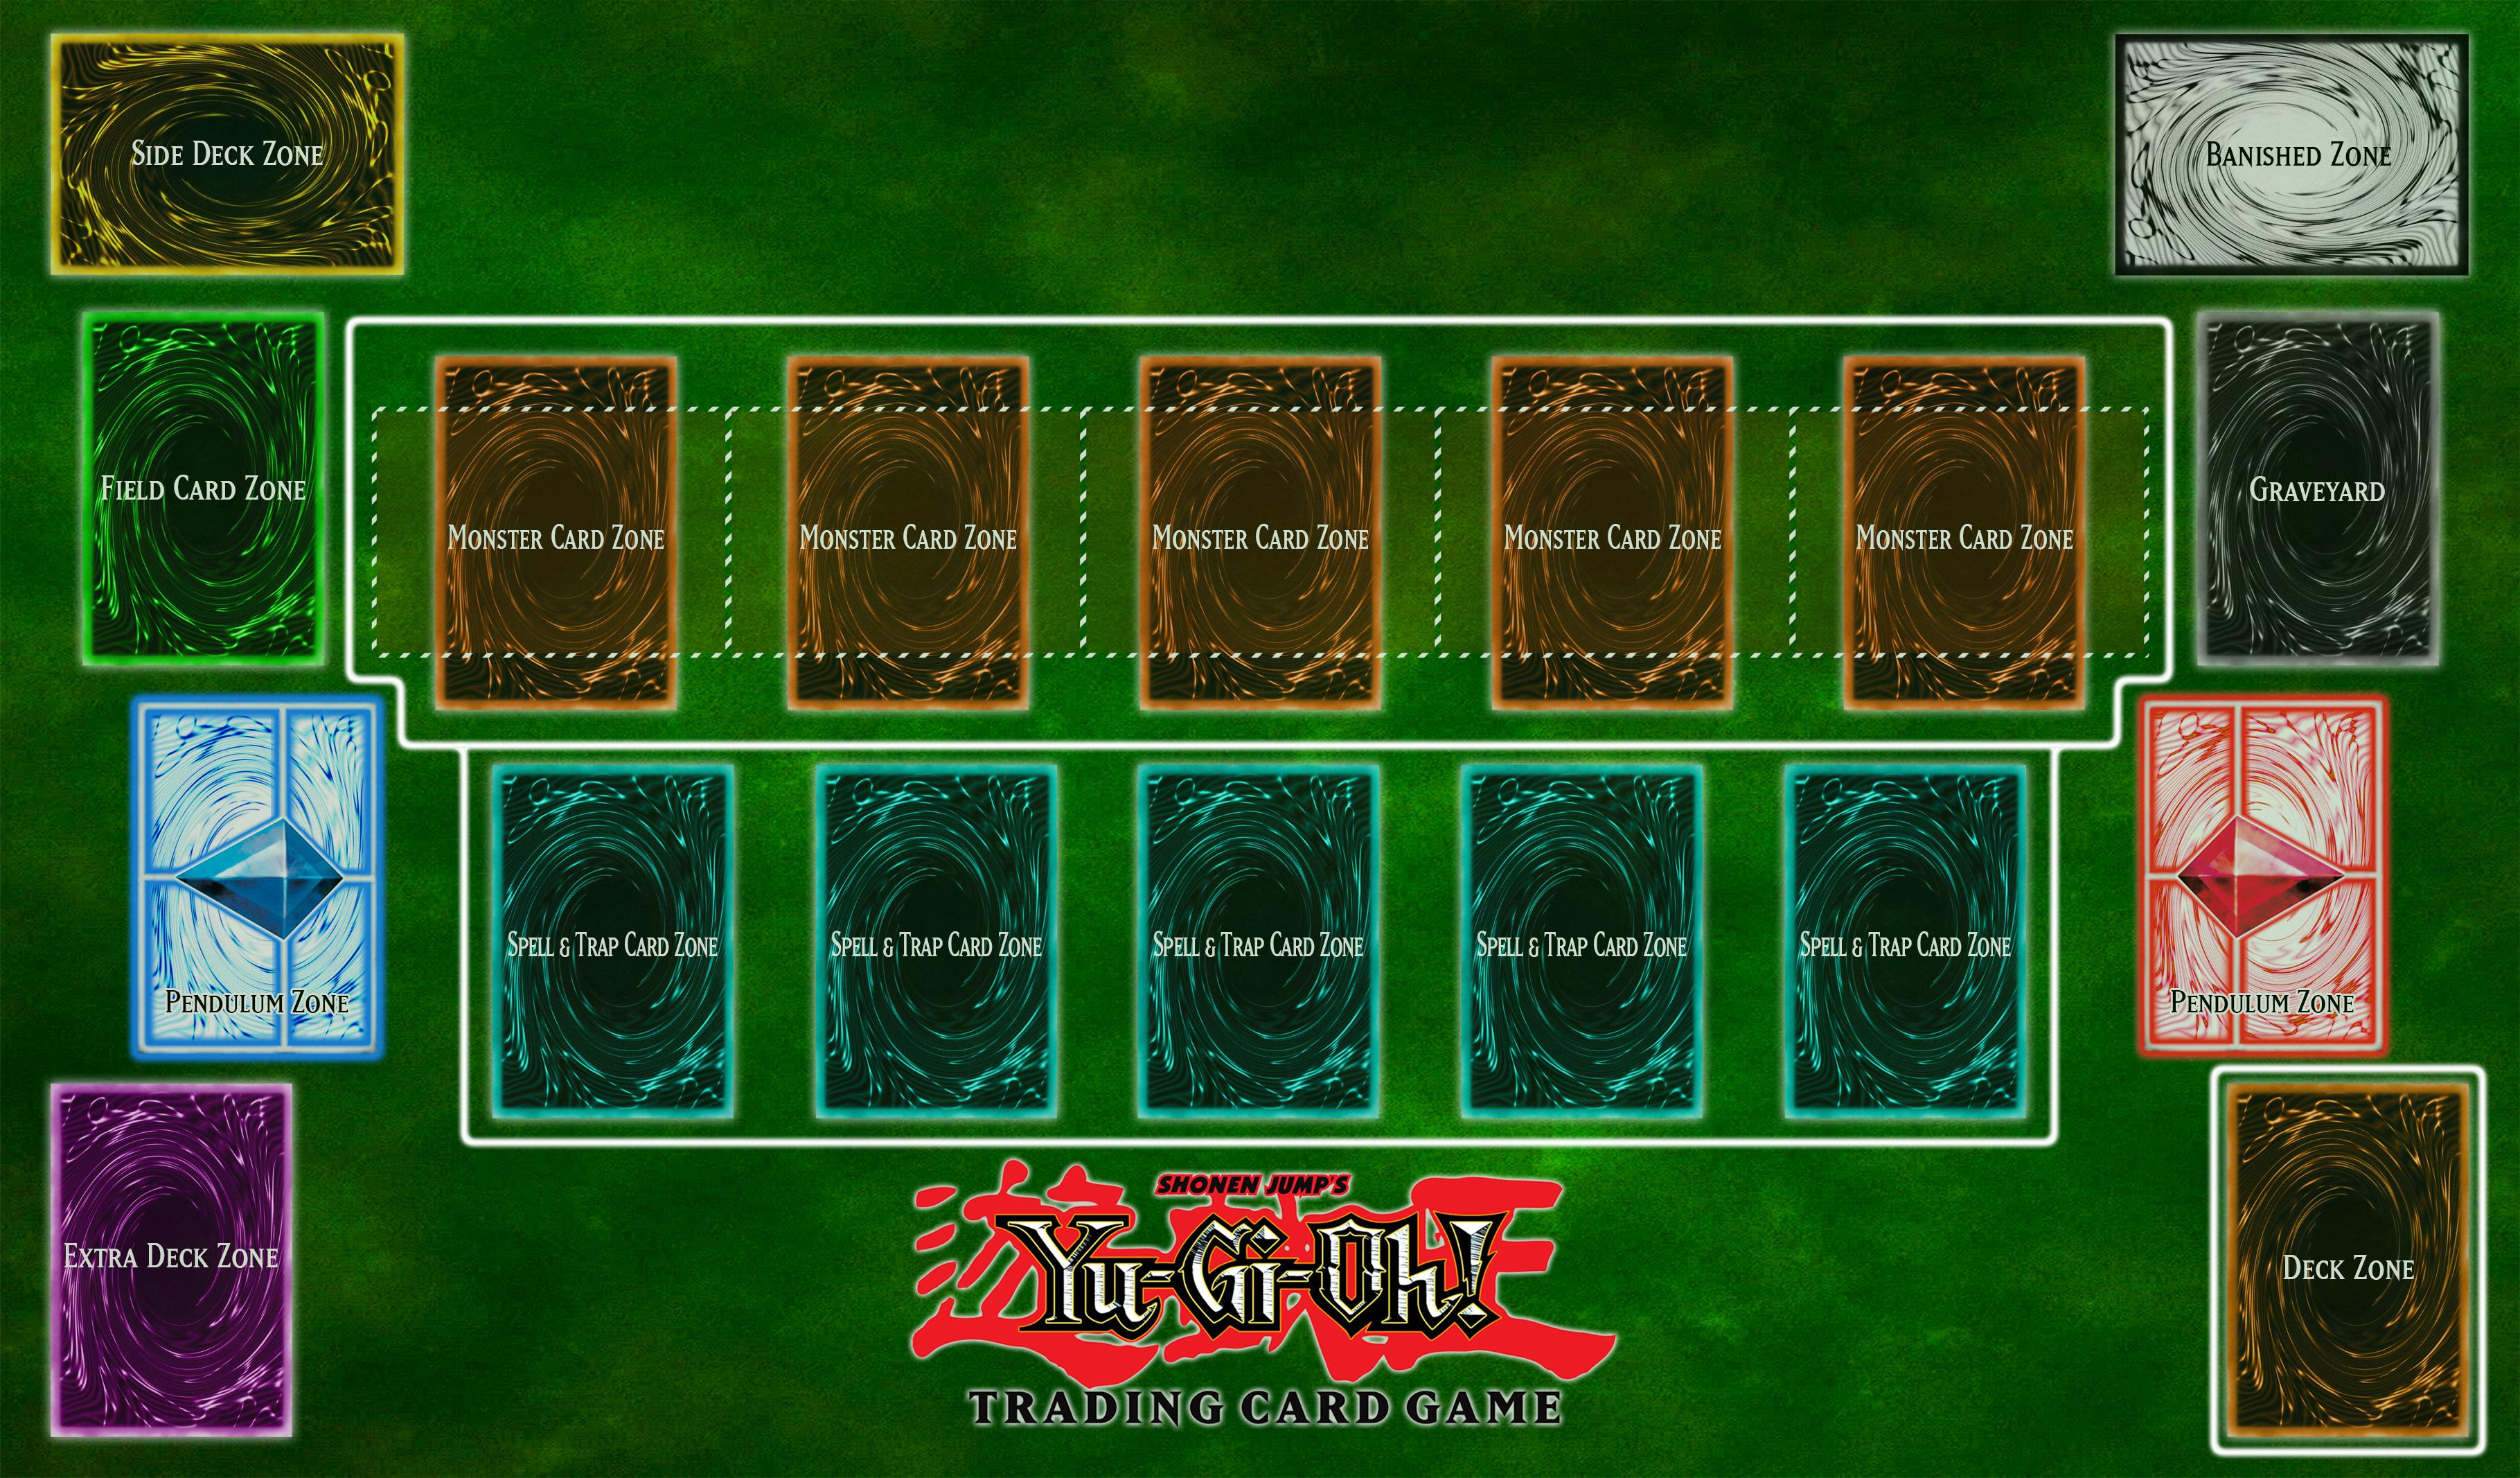 Yu-Gi-Oh! Playmat v2 by CLANNADAT on DeviantArt